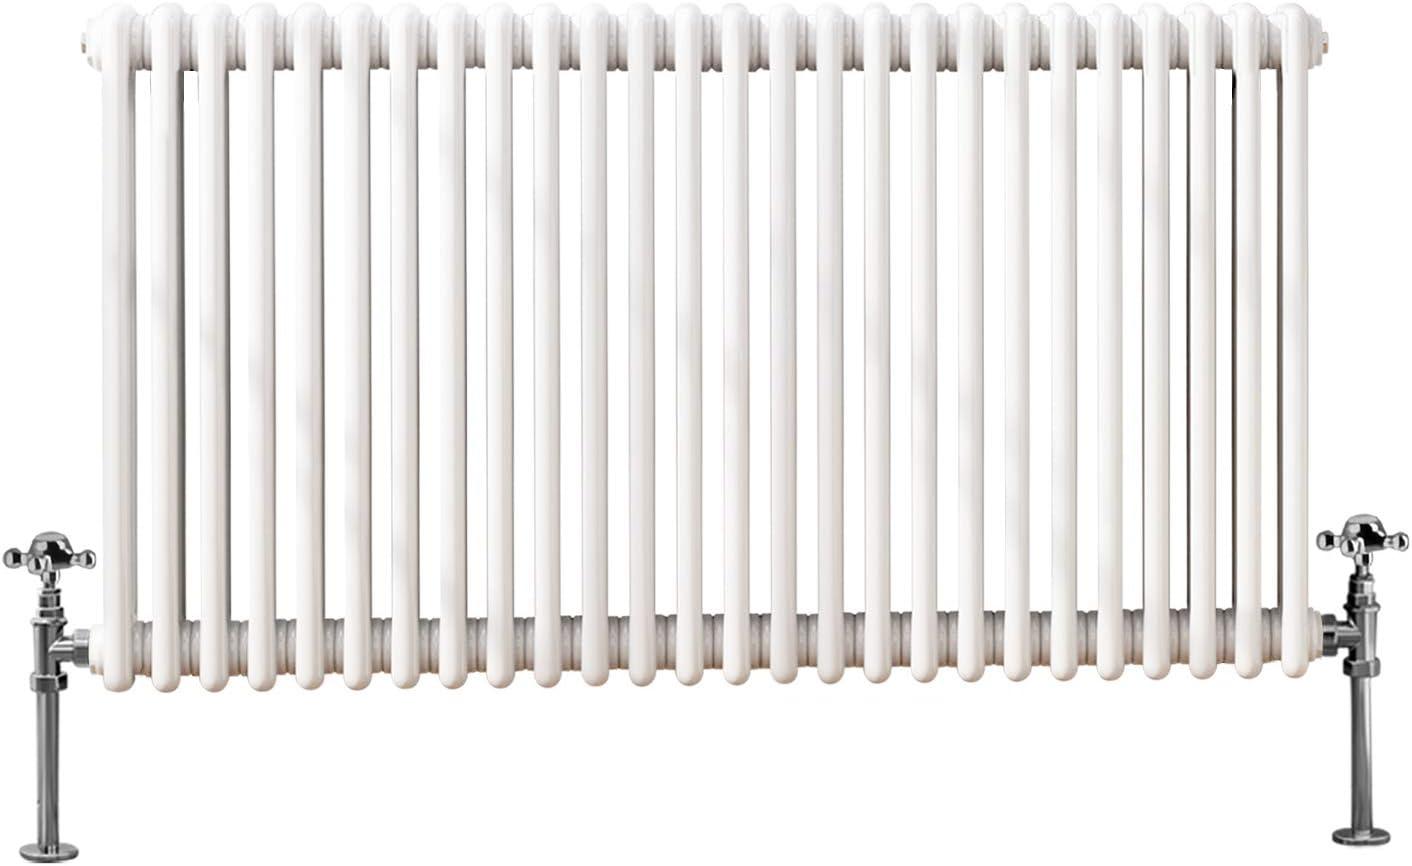 NRG 300x1460 Cast Iron Horizontal Radiator Anthracite 2 Column Central Heating Rads